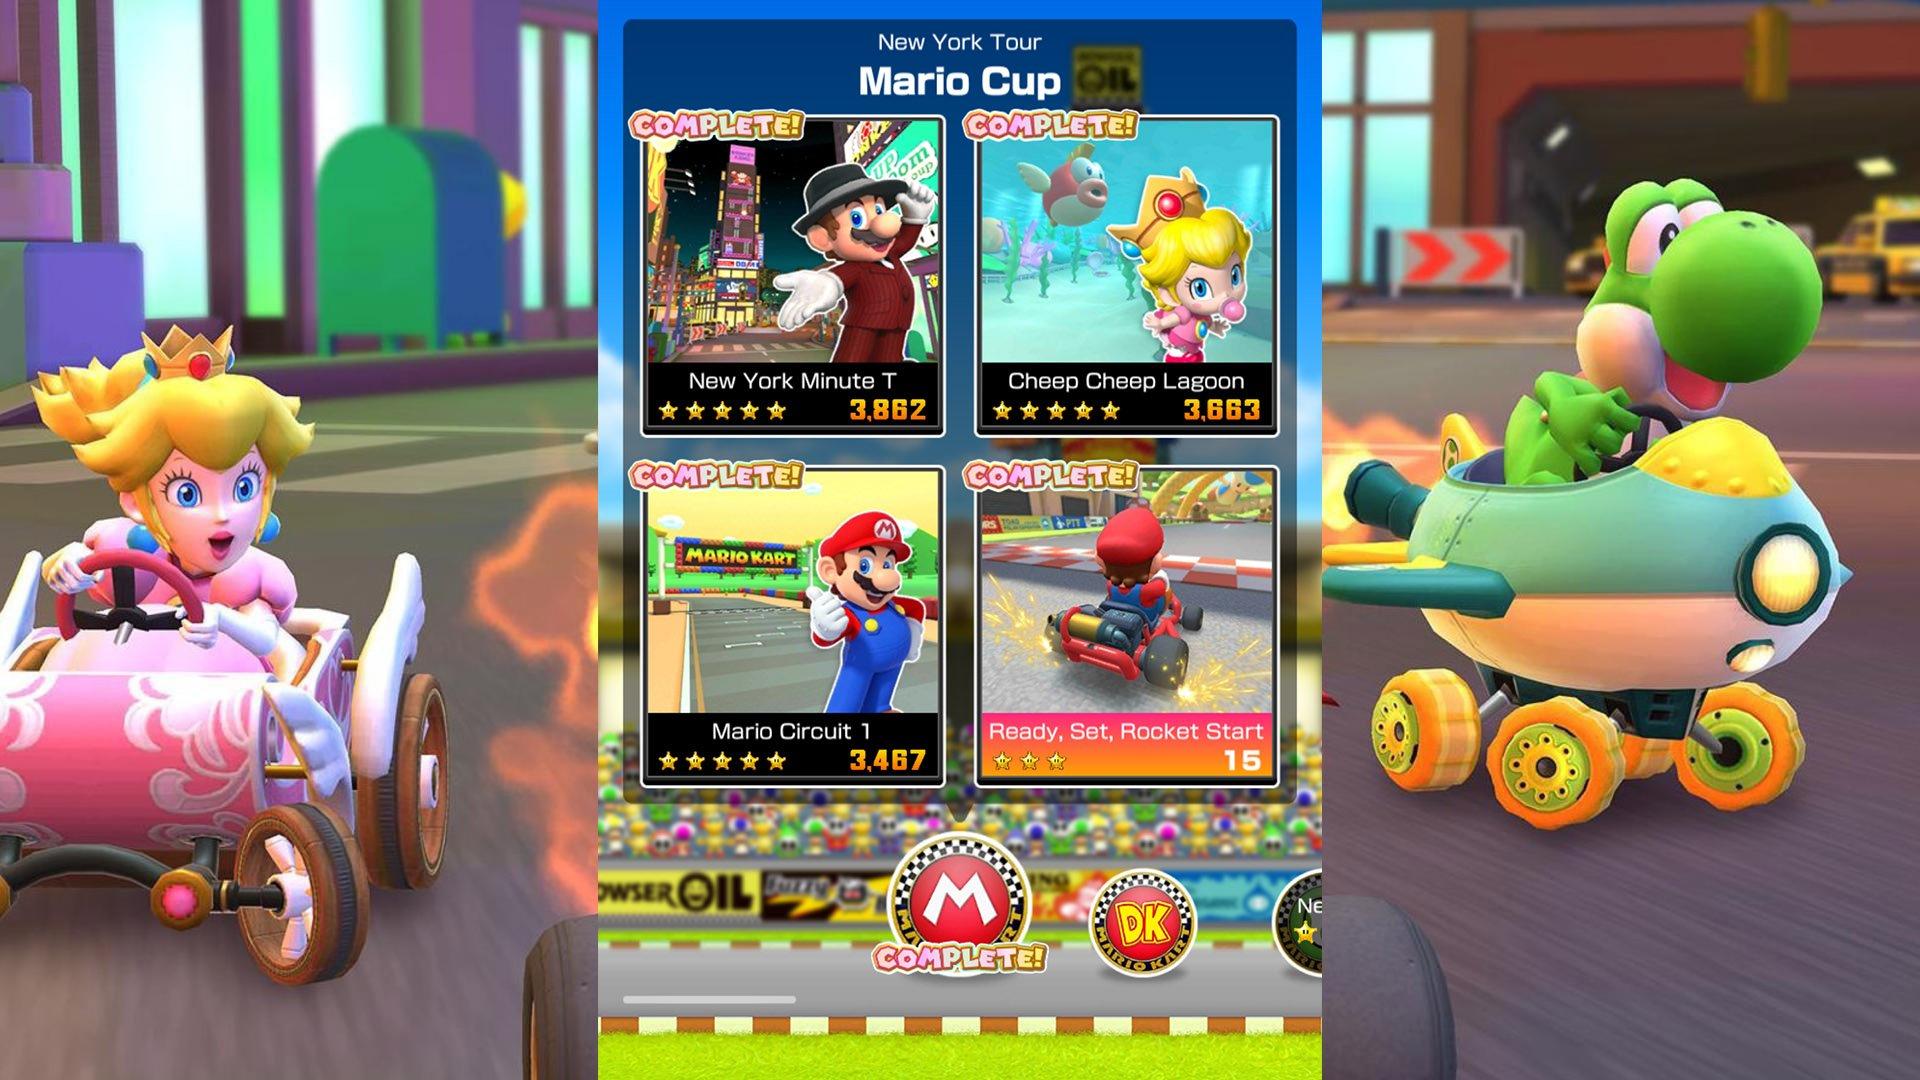 How to unlock challenges in Mario Kart Tour